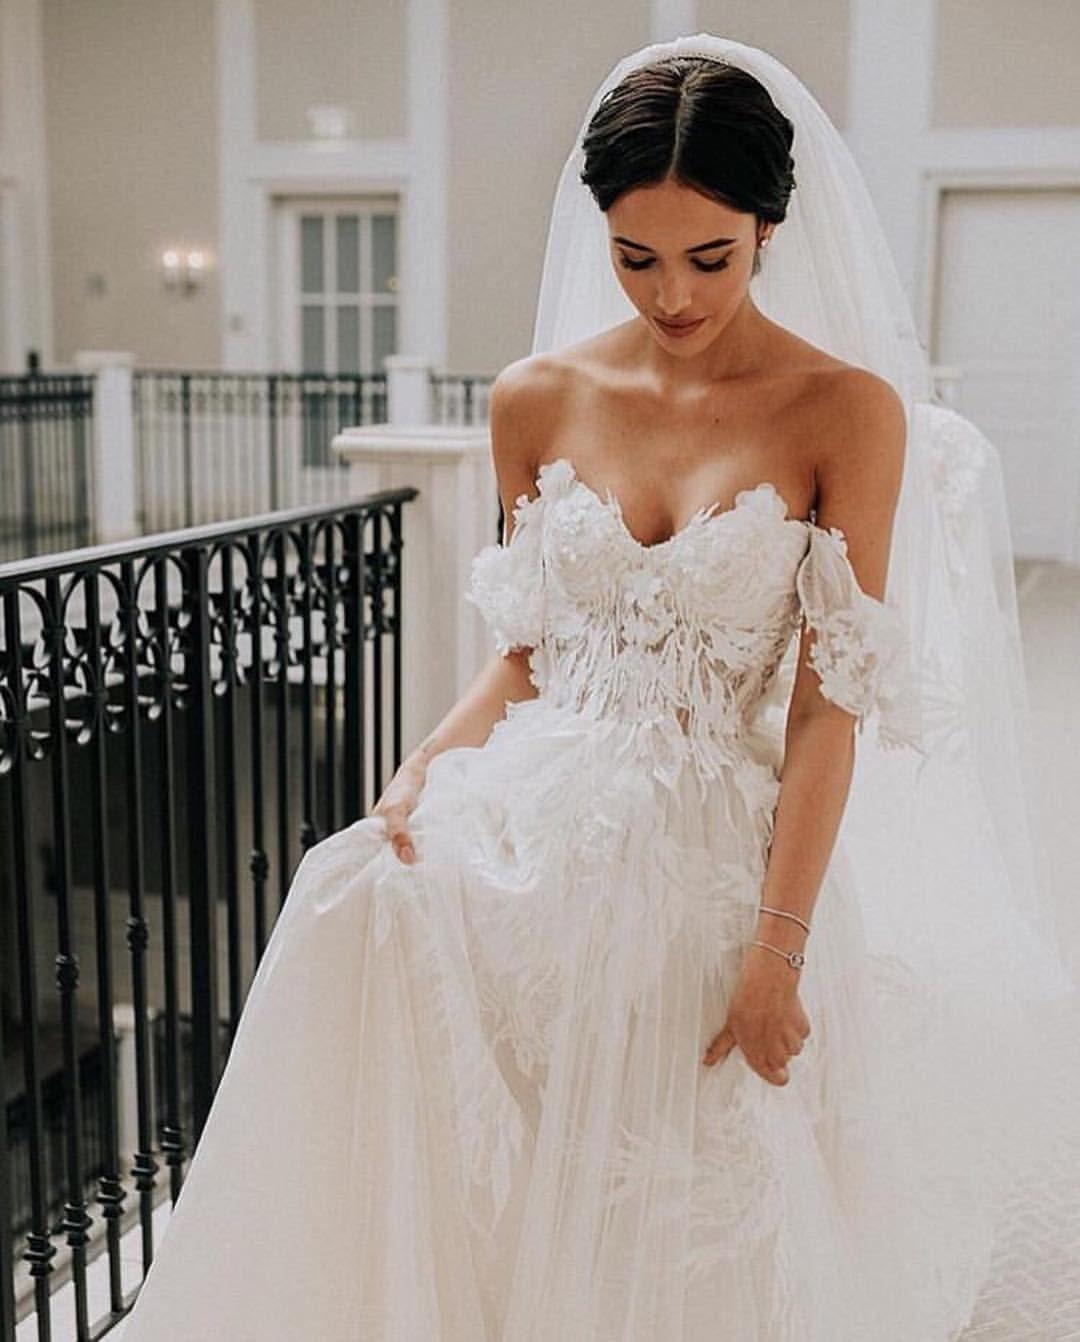 902 Likes 9 Comments Wedding Diary Weddingpeace On Instagram Absolutely Stunni Wedding Dress Train Sweep Train Wedding Dress Wedding Dresses 3d Flowers [ 1342 x 1080 Pixel ]